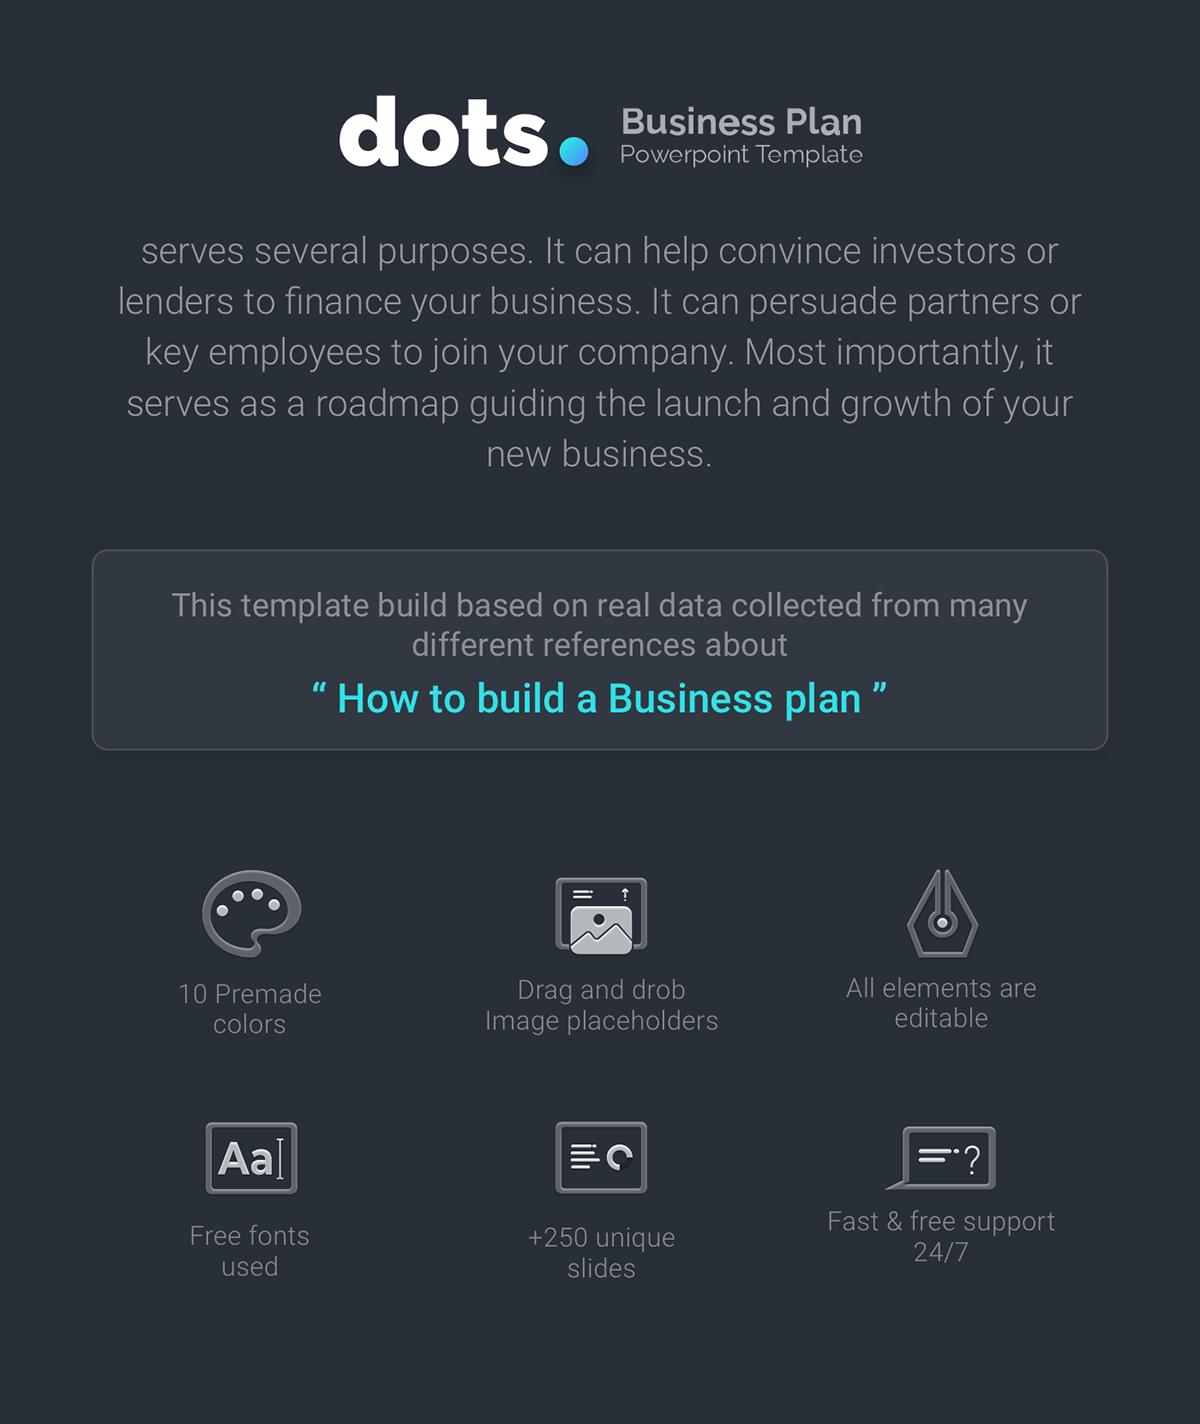 Dots Business Plan Powerpoint Template On Behance